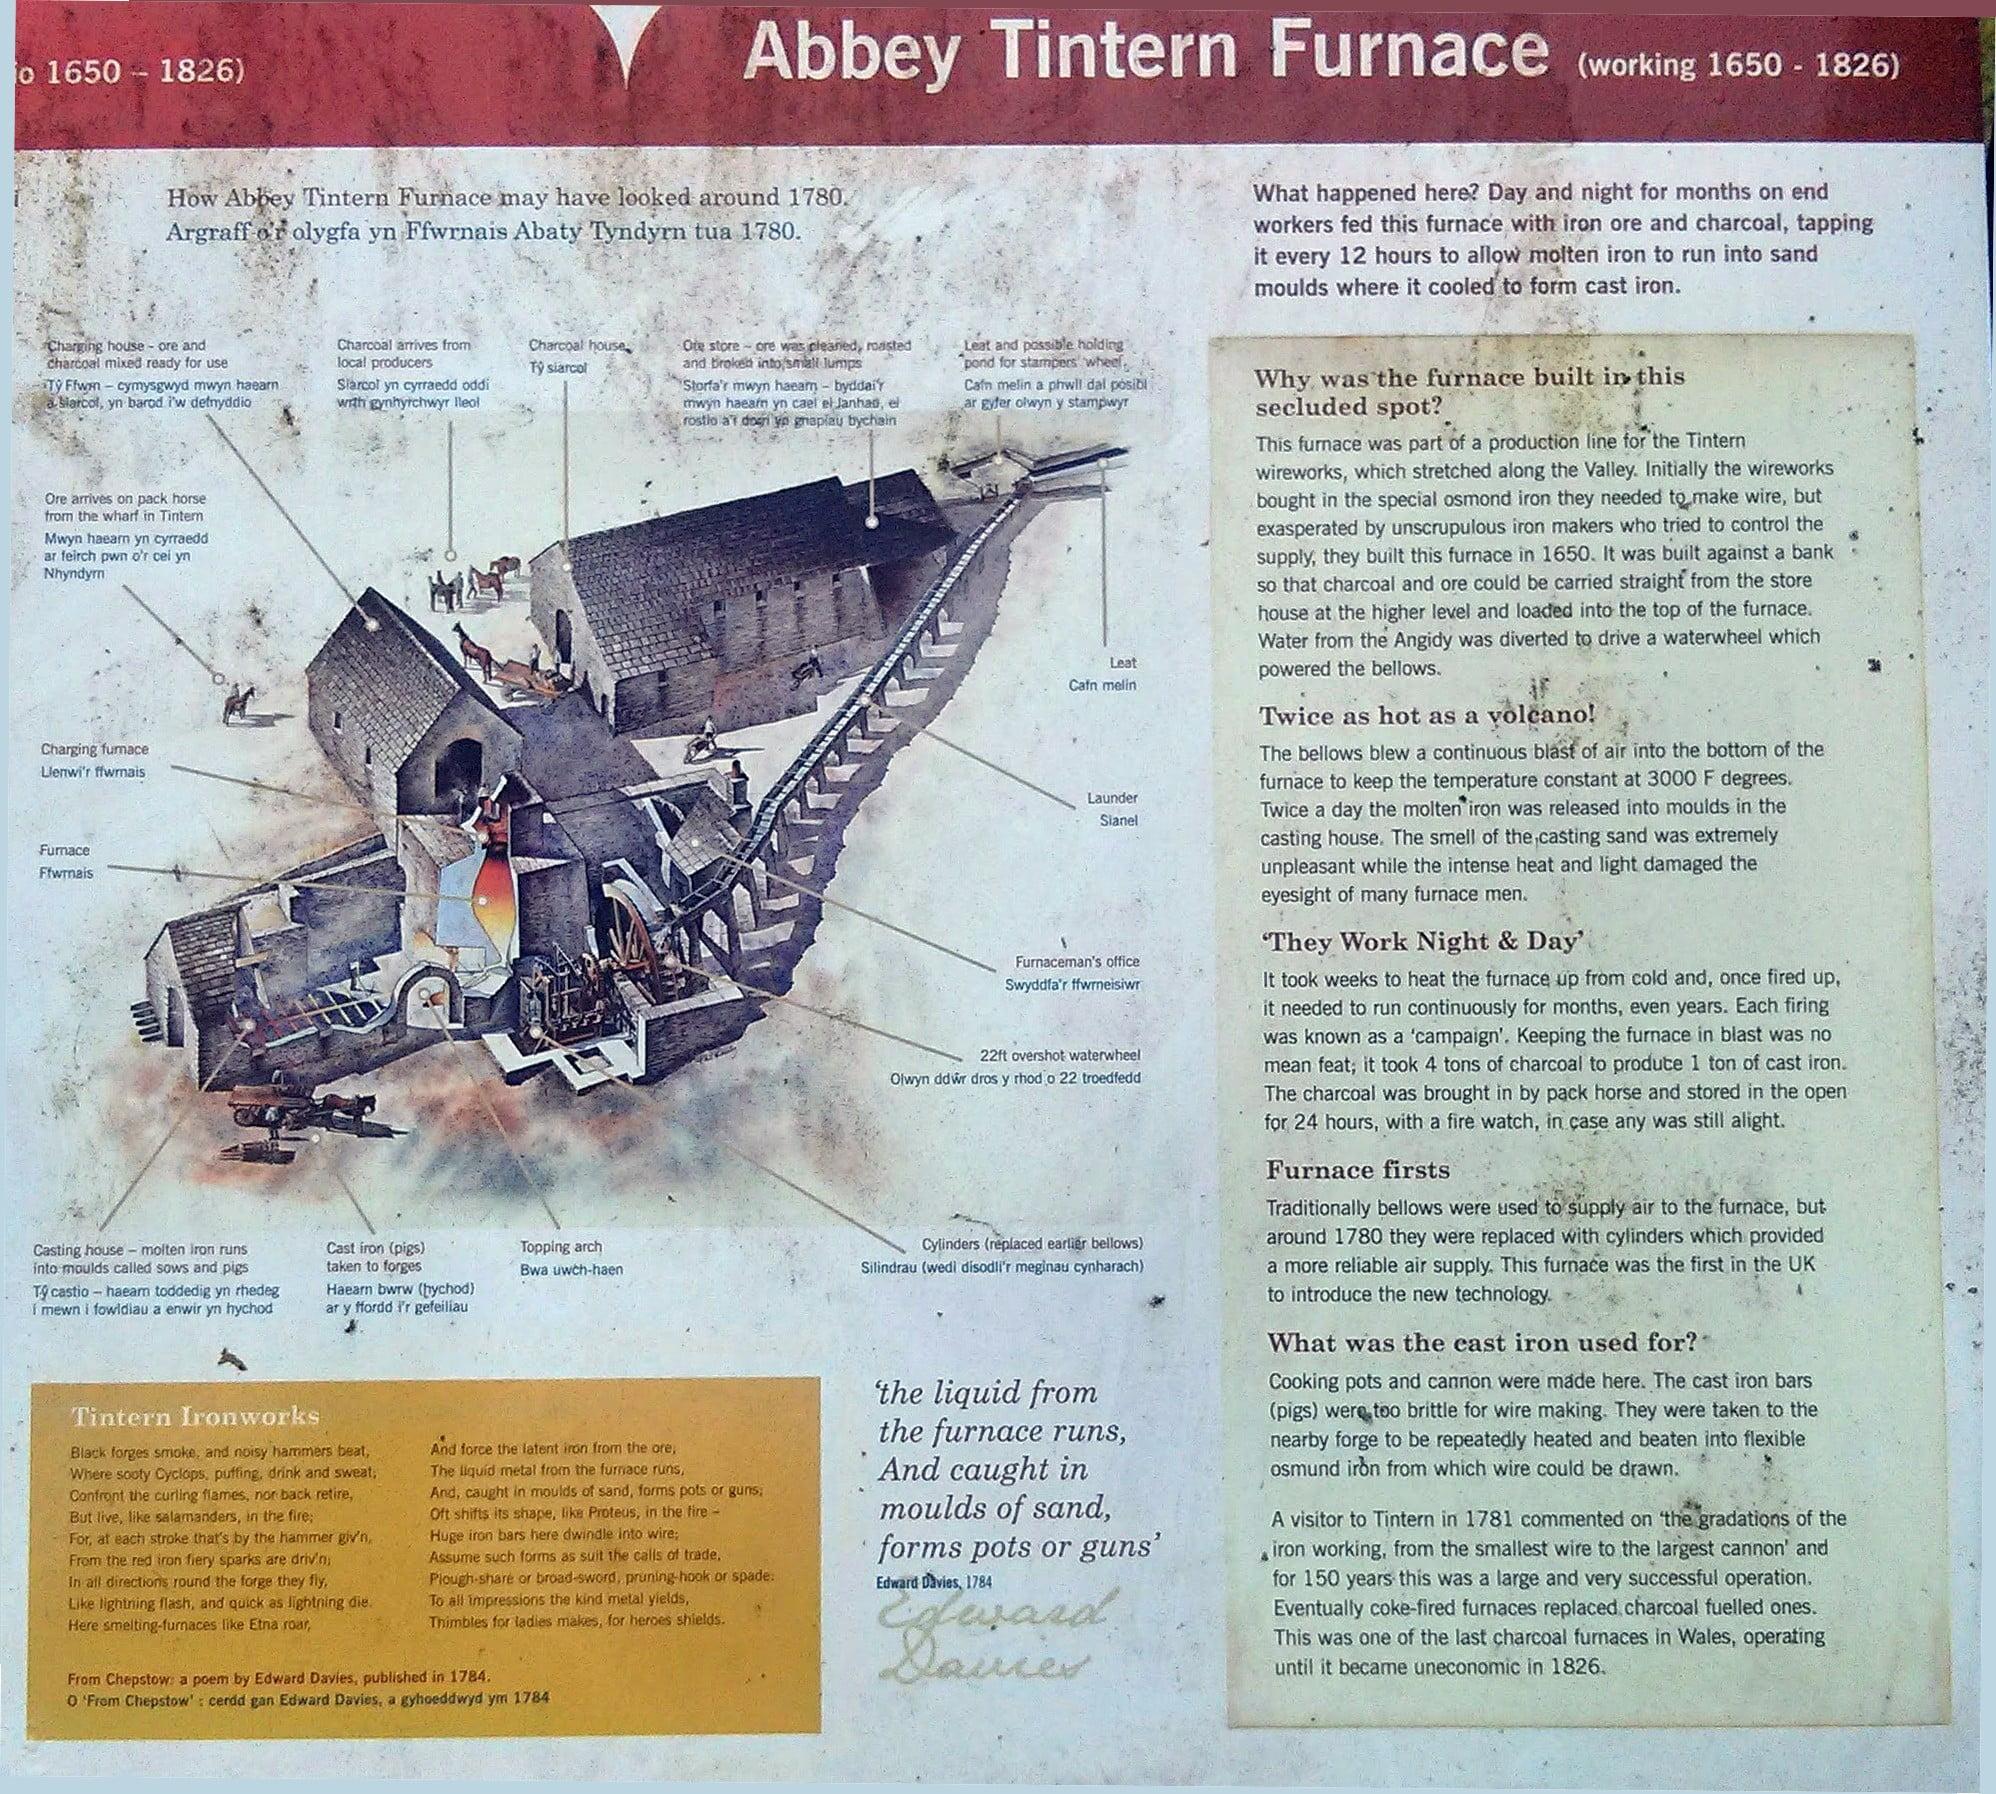 Abbey Tintern Furnace copyright Maryann Soper